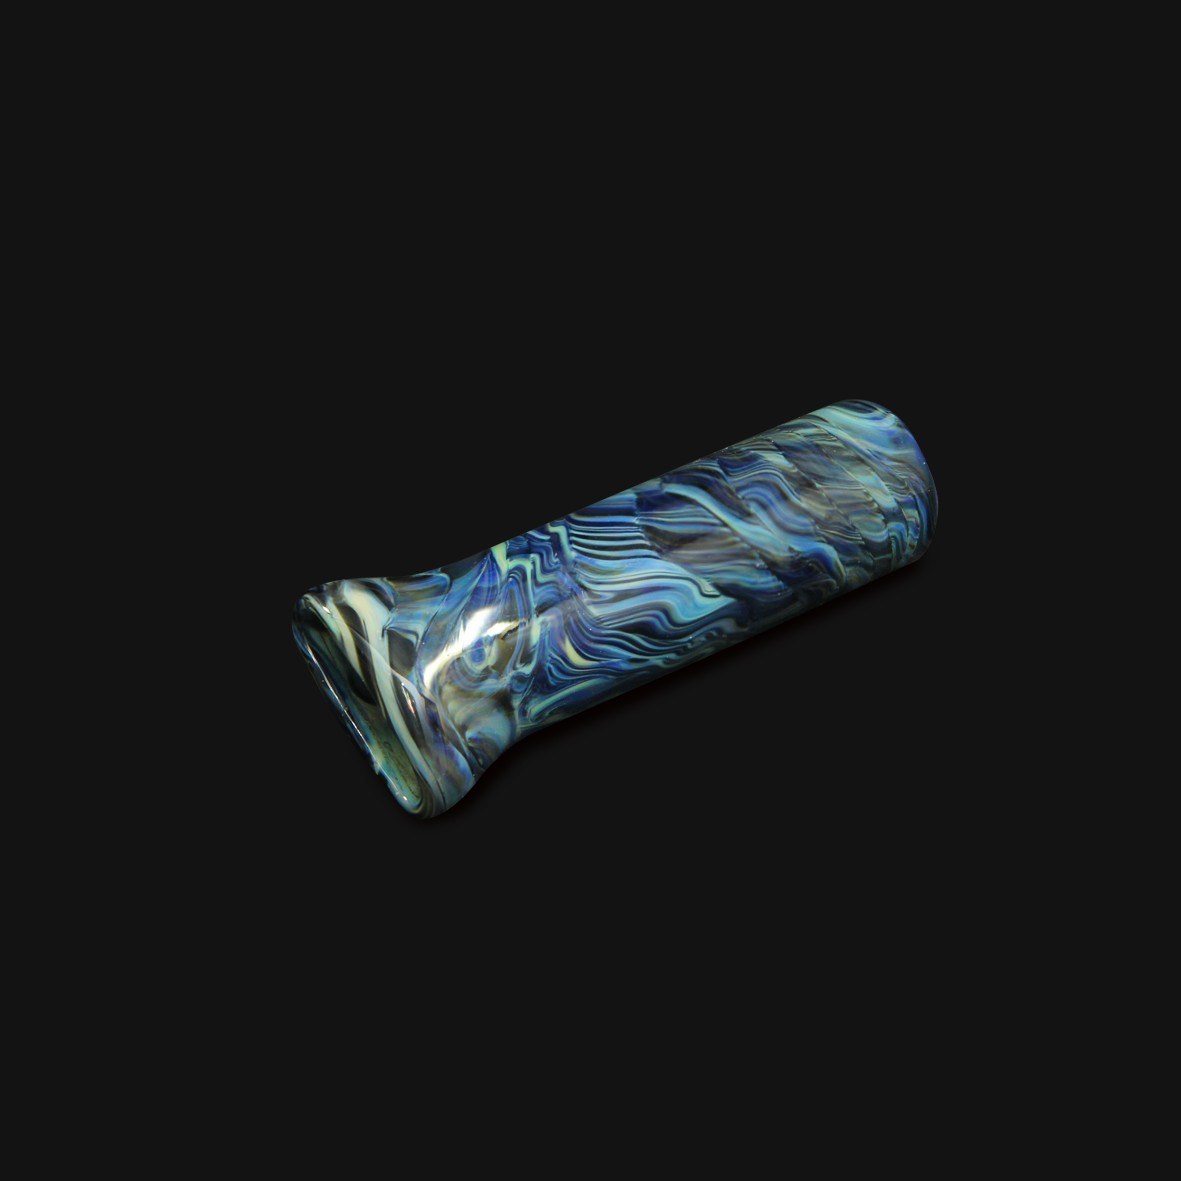 Piteira de vidro Living Corals #03